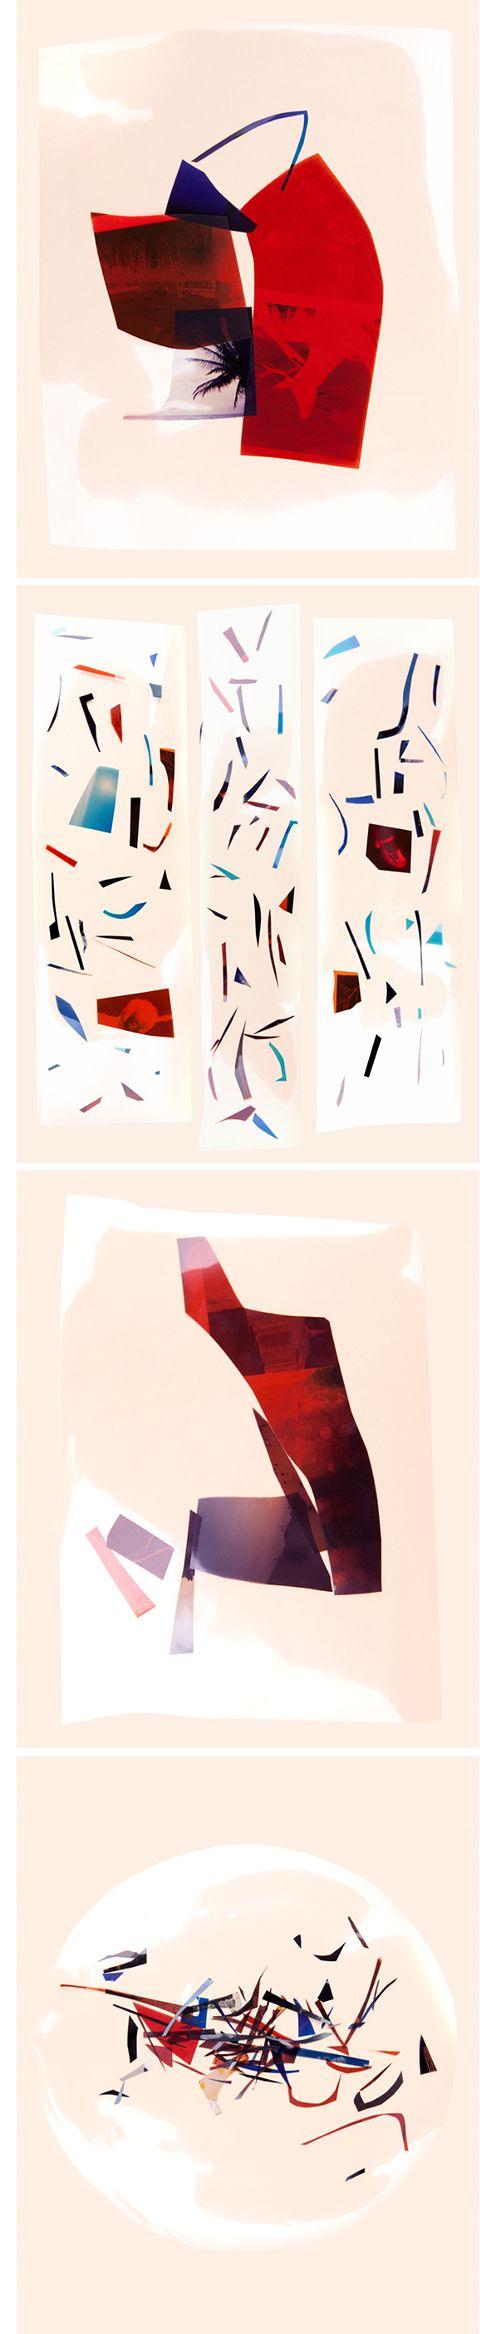 Brea Souders    via http://breasouders.com/Art Work, Http Breasoud Com, Painting Art, Cut Film, Brea Souders, Graphics Design, Paper Planes, Http Breasouders Com